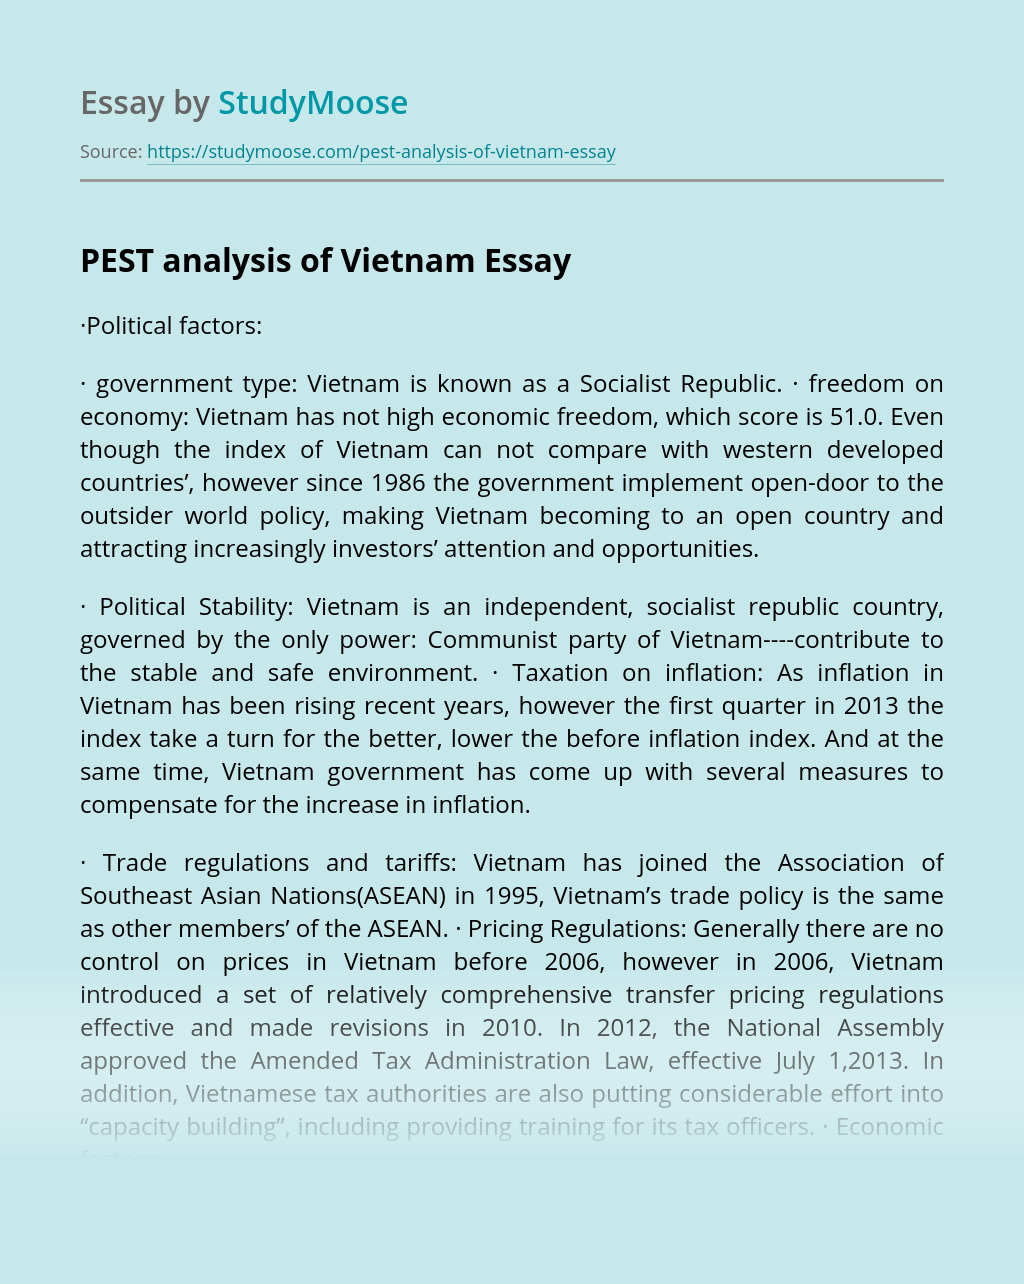 PEST Analysis of Vietnam